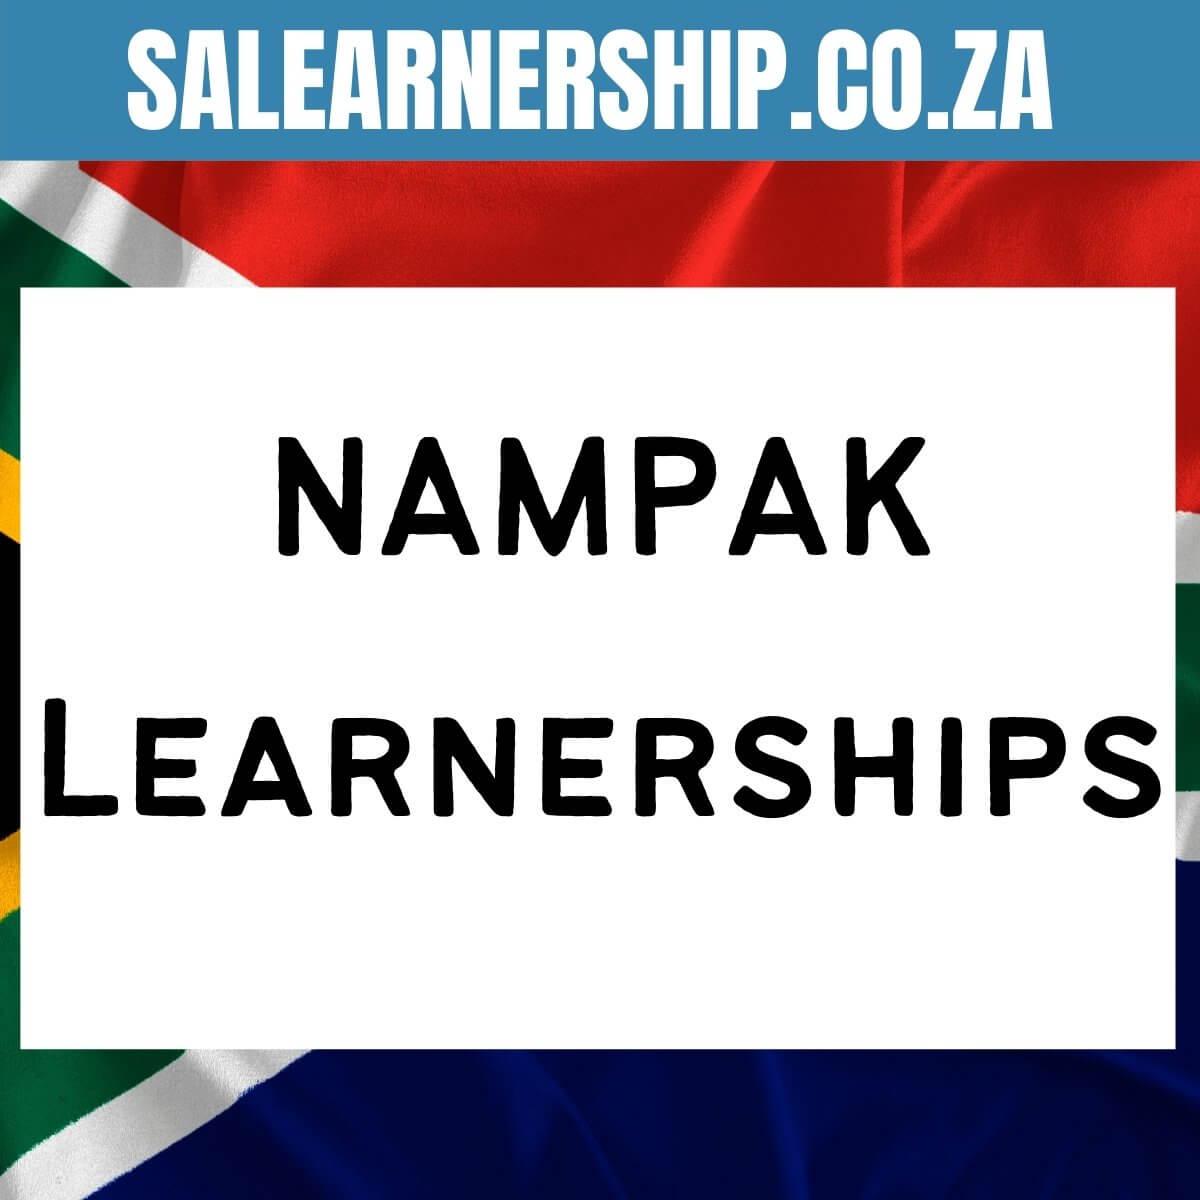 NAMPAK Learnerships